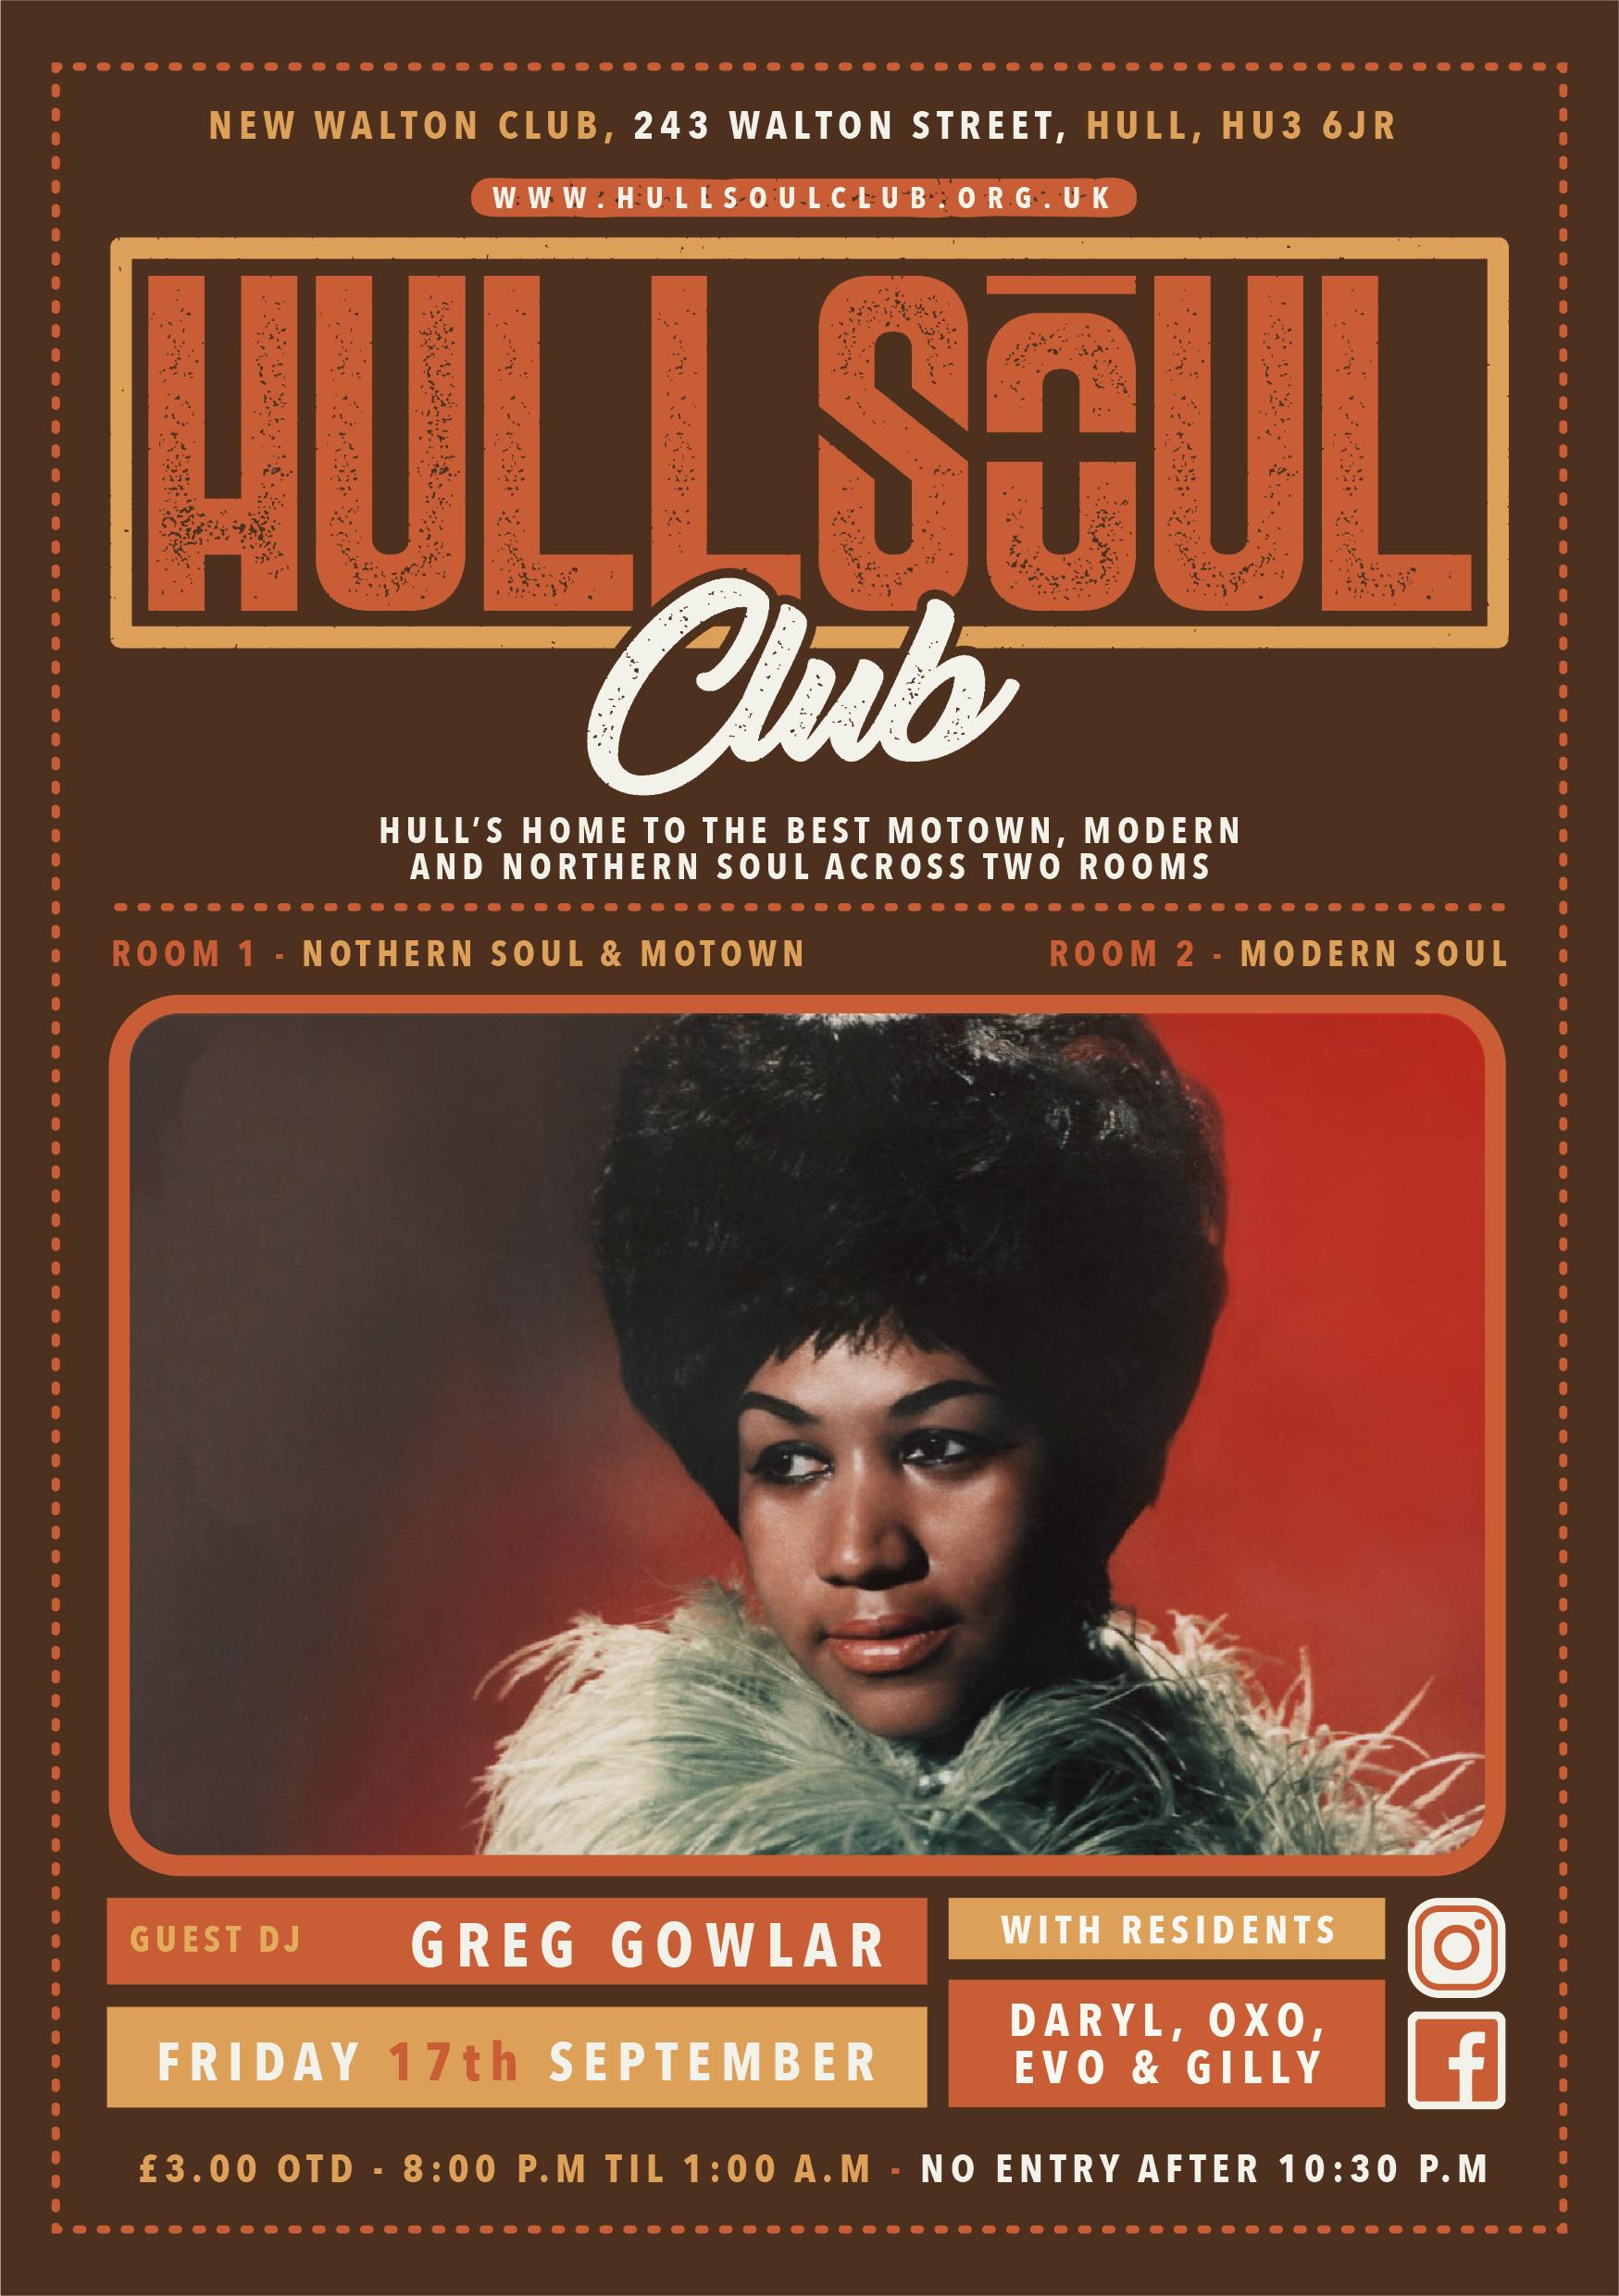 Hull Soul Club flyer